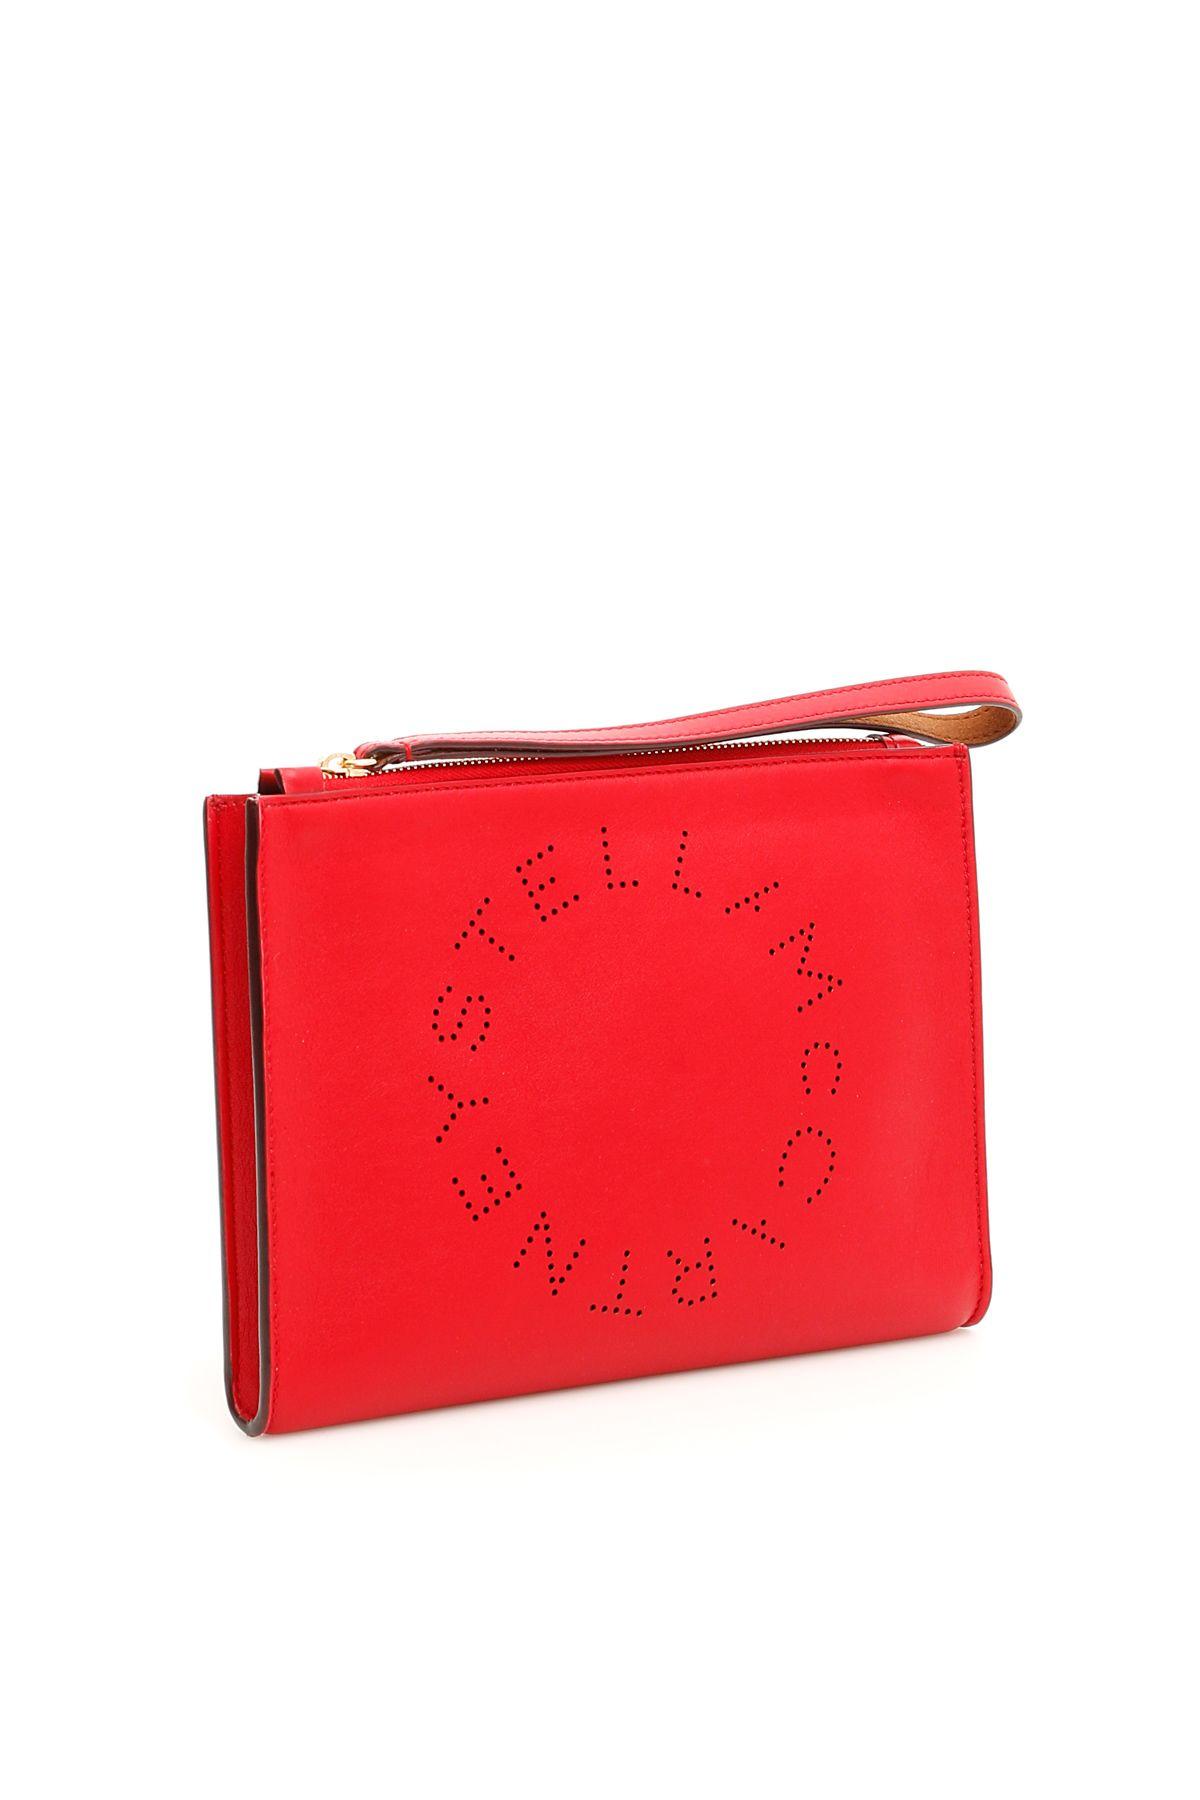 f3105c15e503 Stella McCartney Stella McCartney Logo Flap Zip Clutch - RED